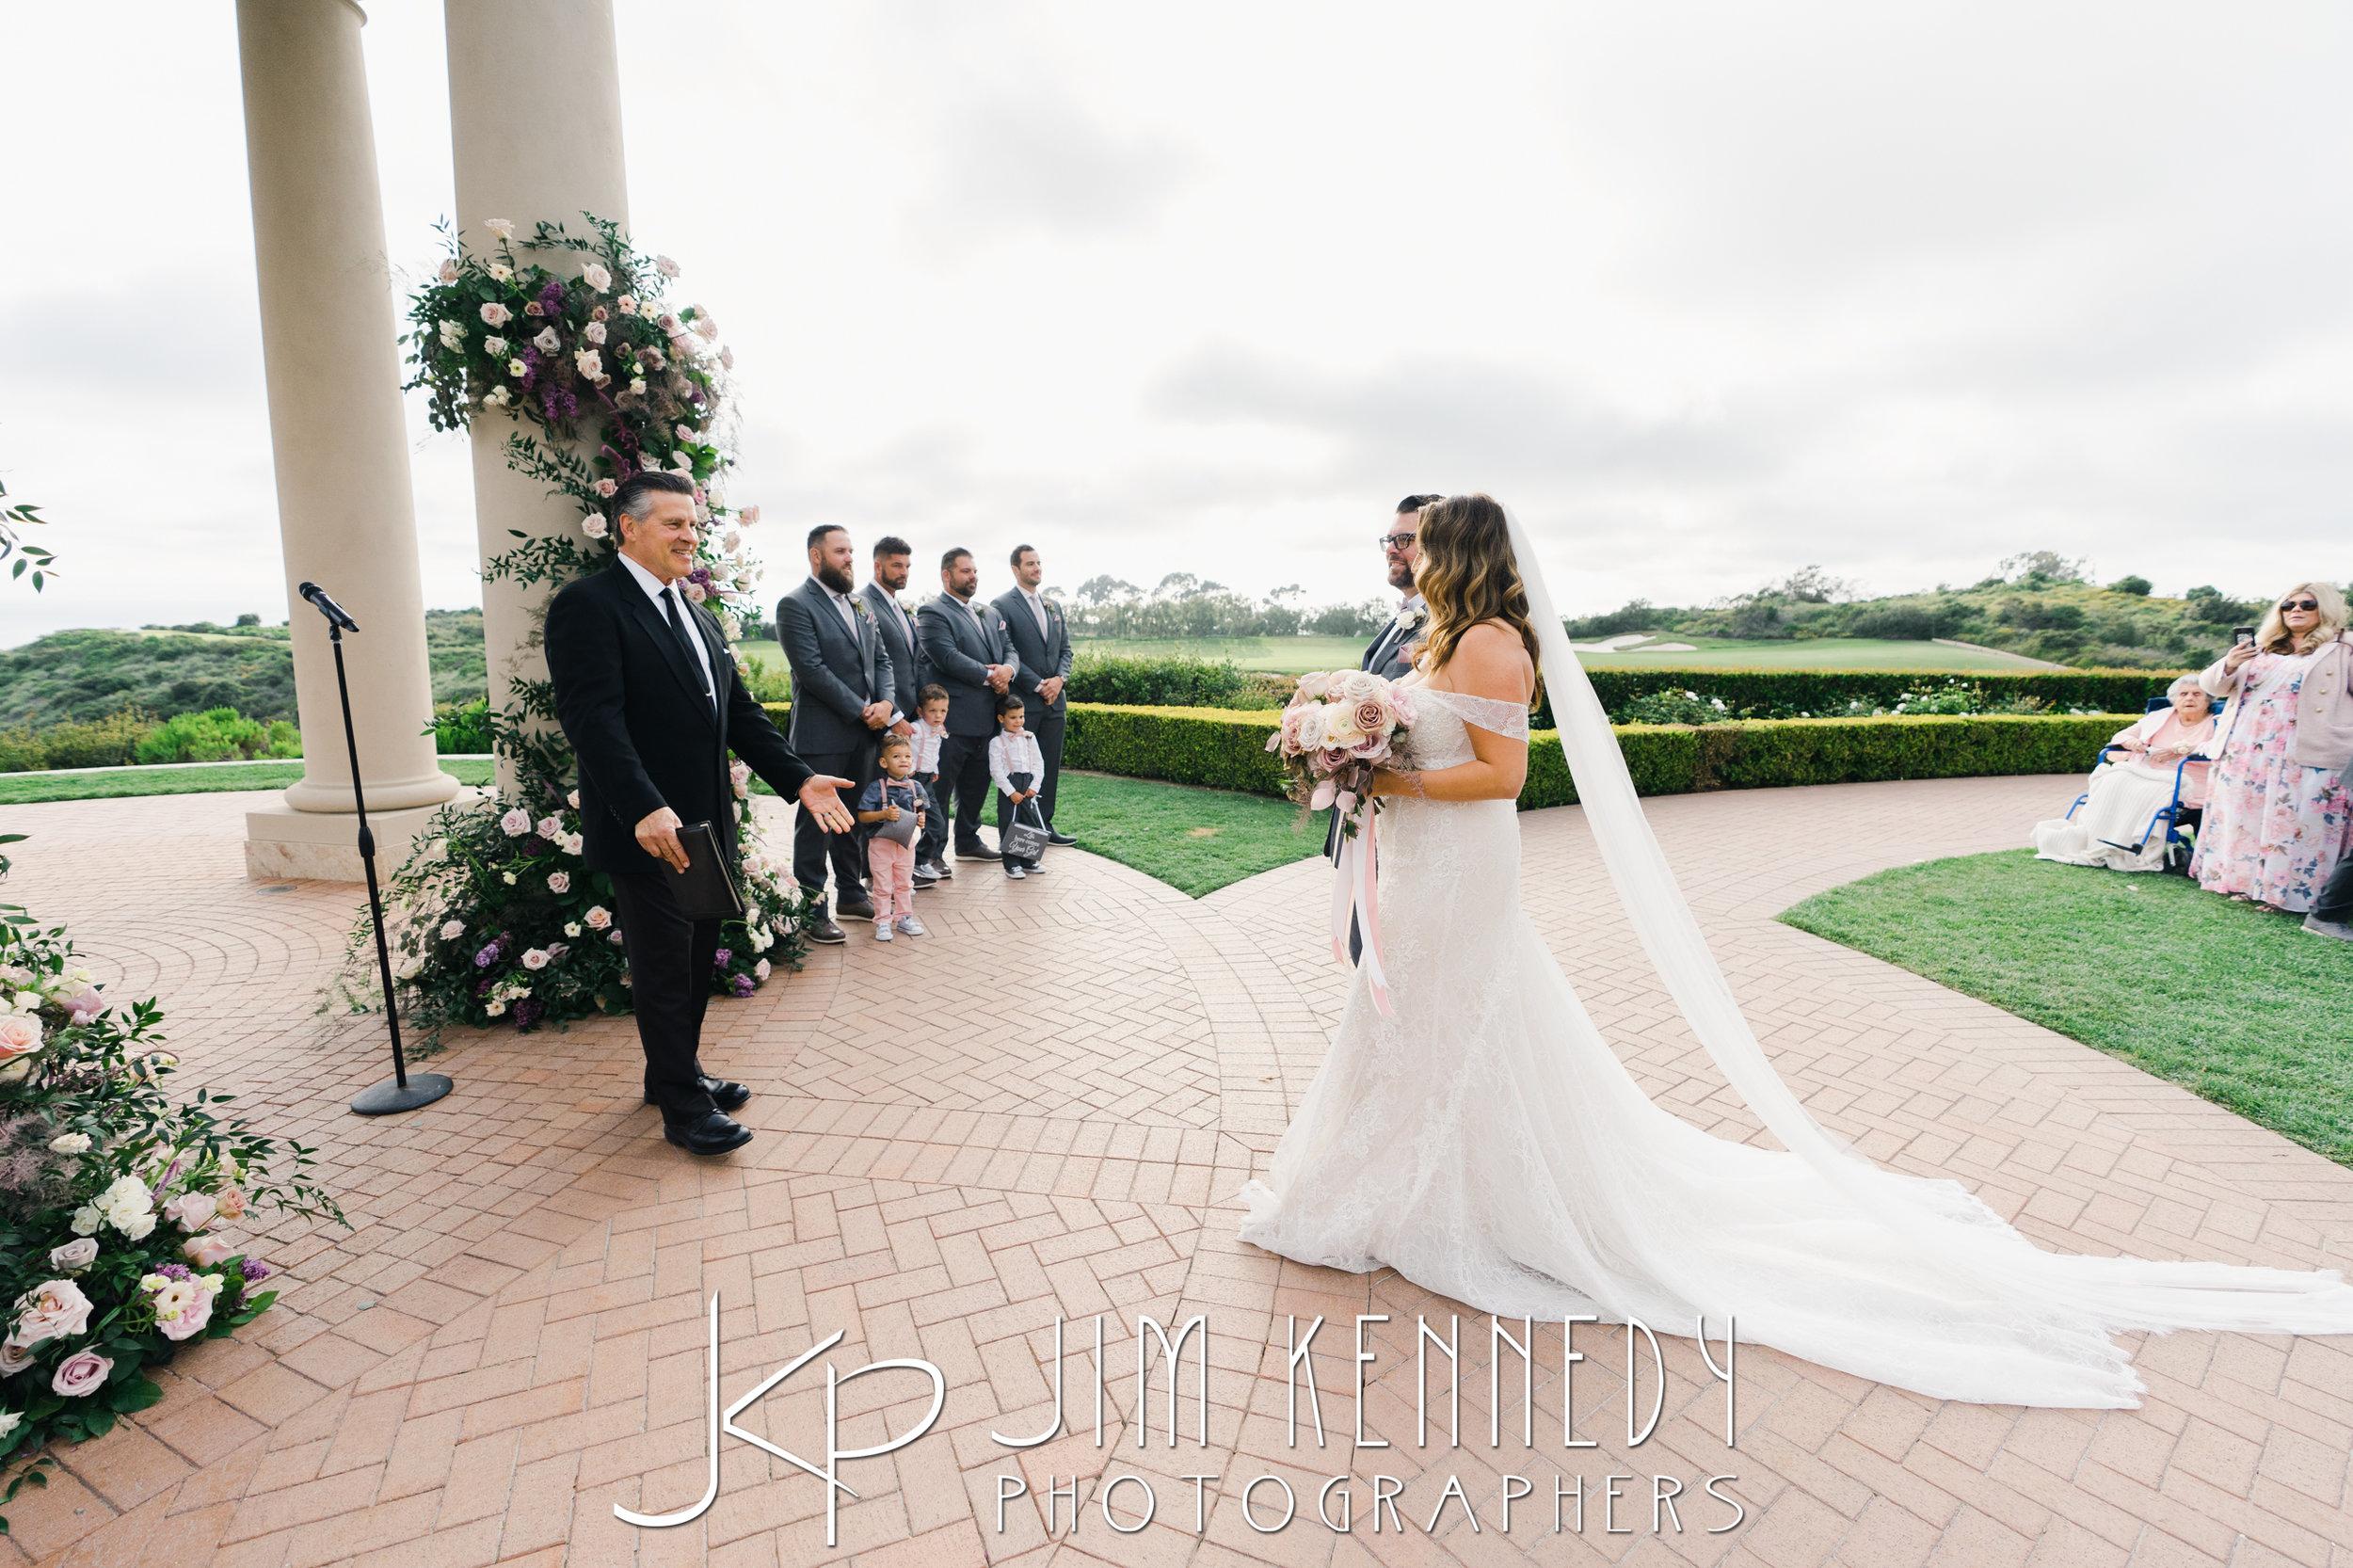 pelican-hill-wedding-jim-kenedy-photographers_0113.JPG